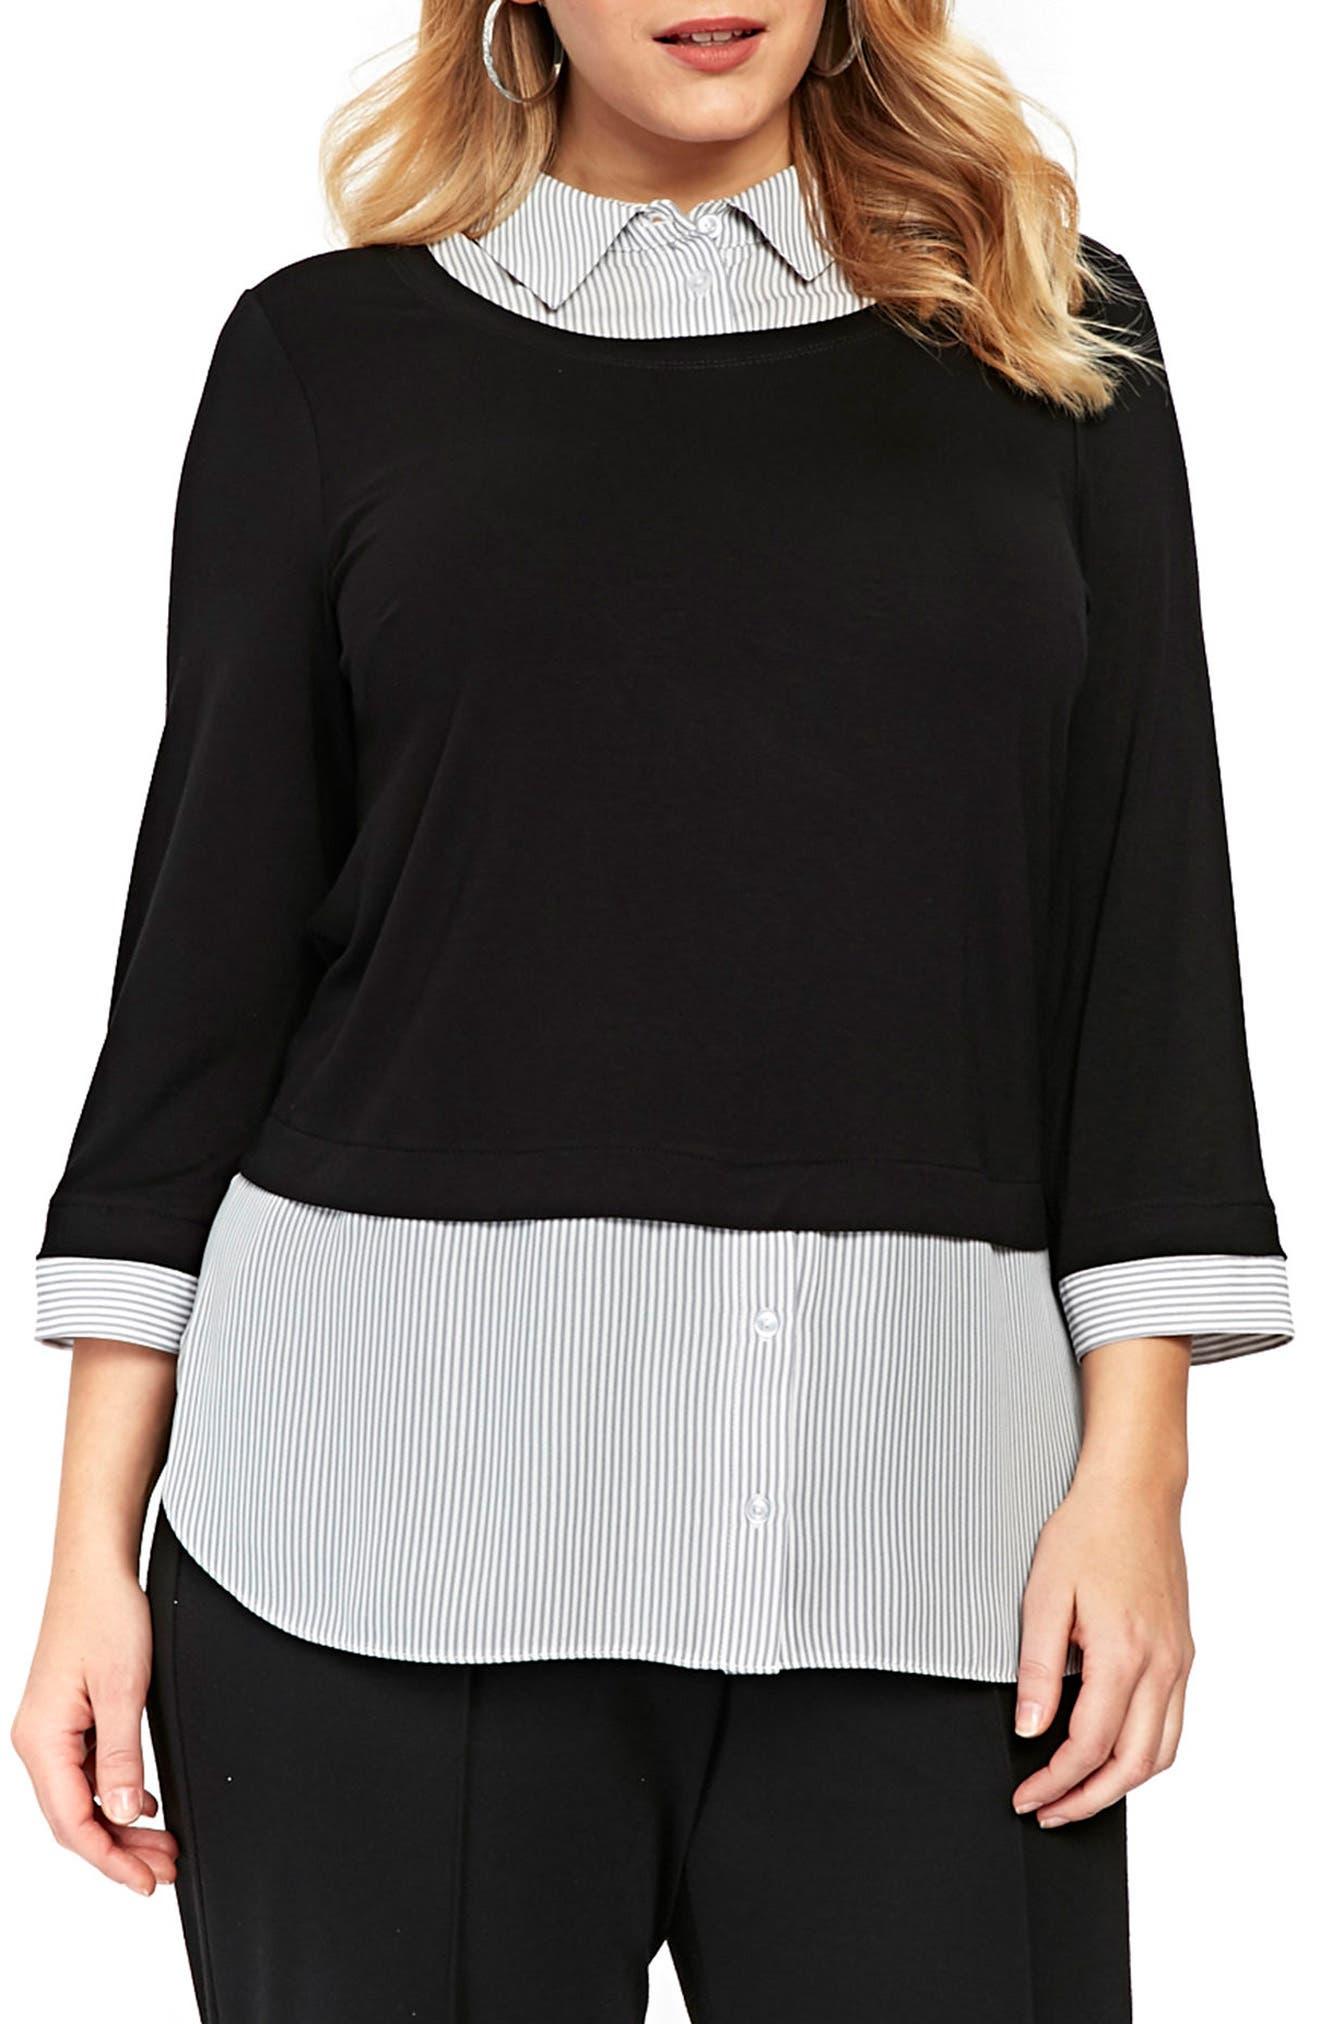 Stripe & Solid 2-in-1 Shirt,                             Main thumbnail 1, color,                             Dark Multi